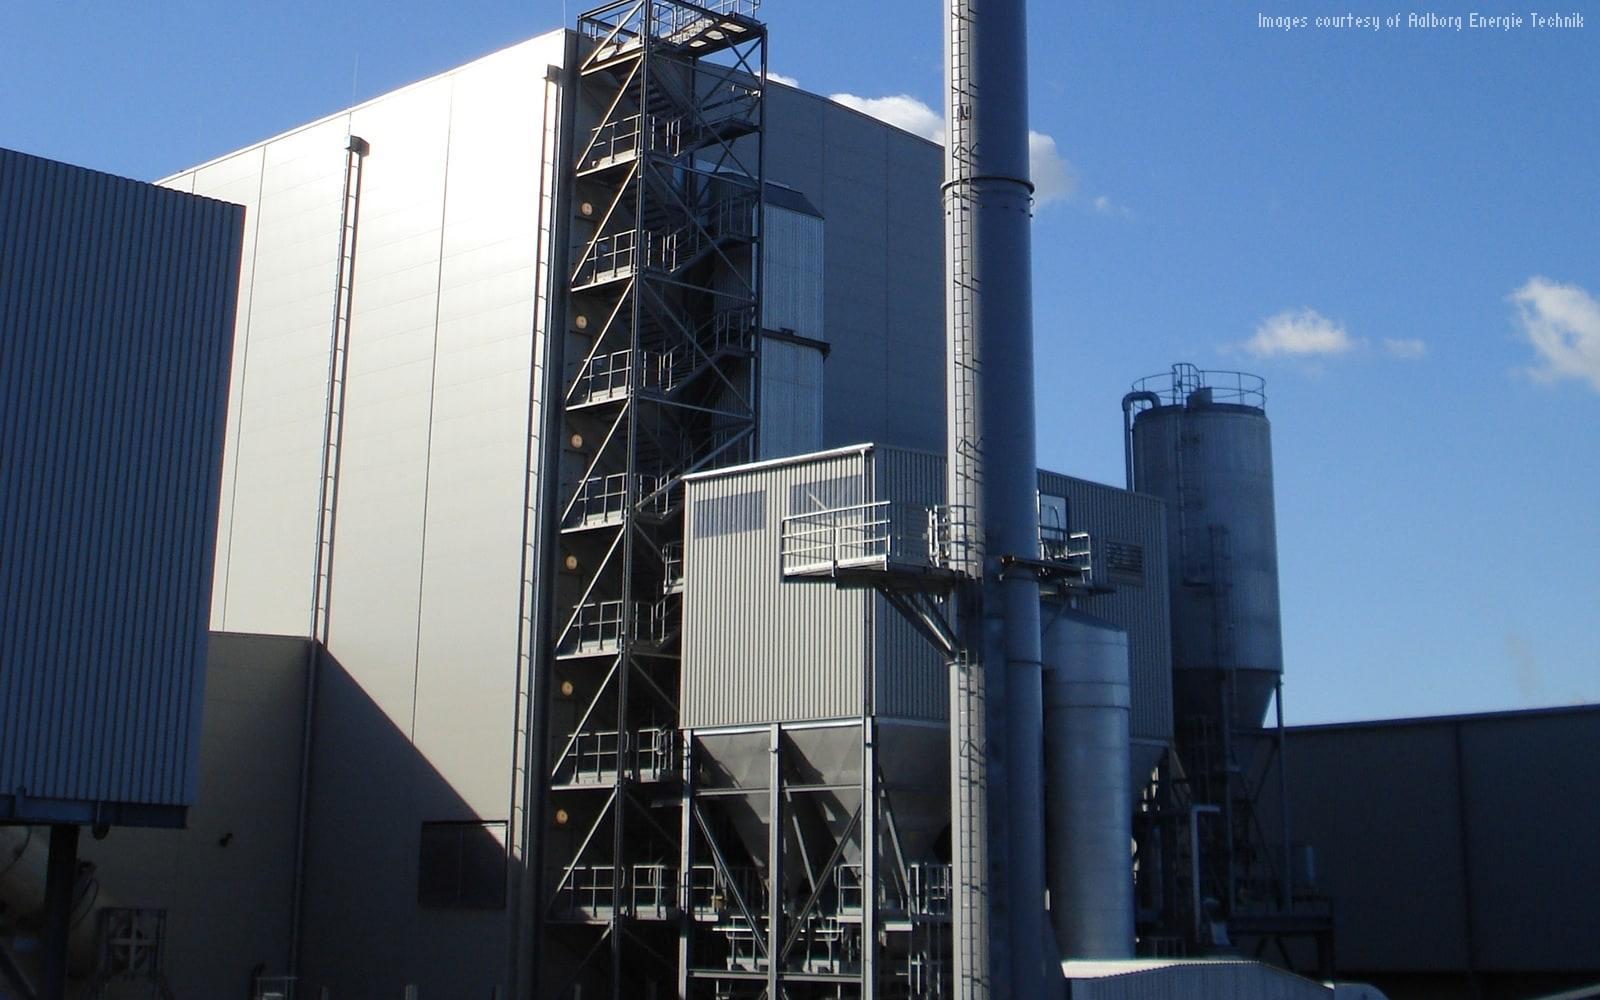 Aalborg Energie Technik Designs Bbiomass Plants With BIM